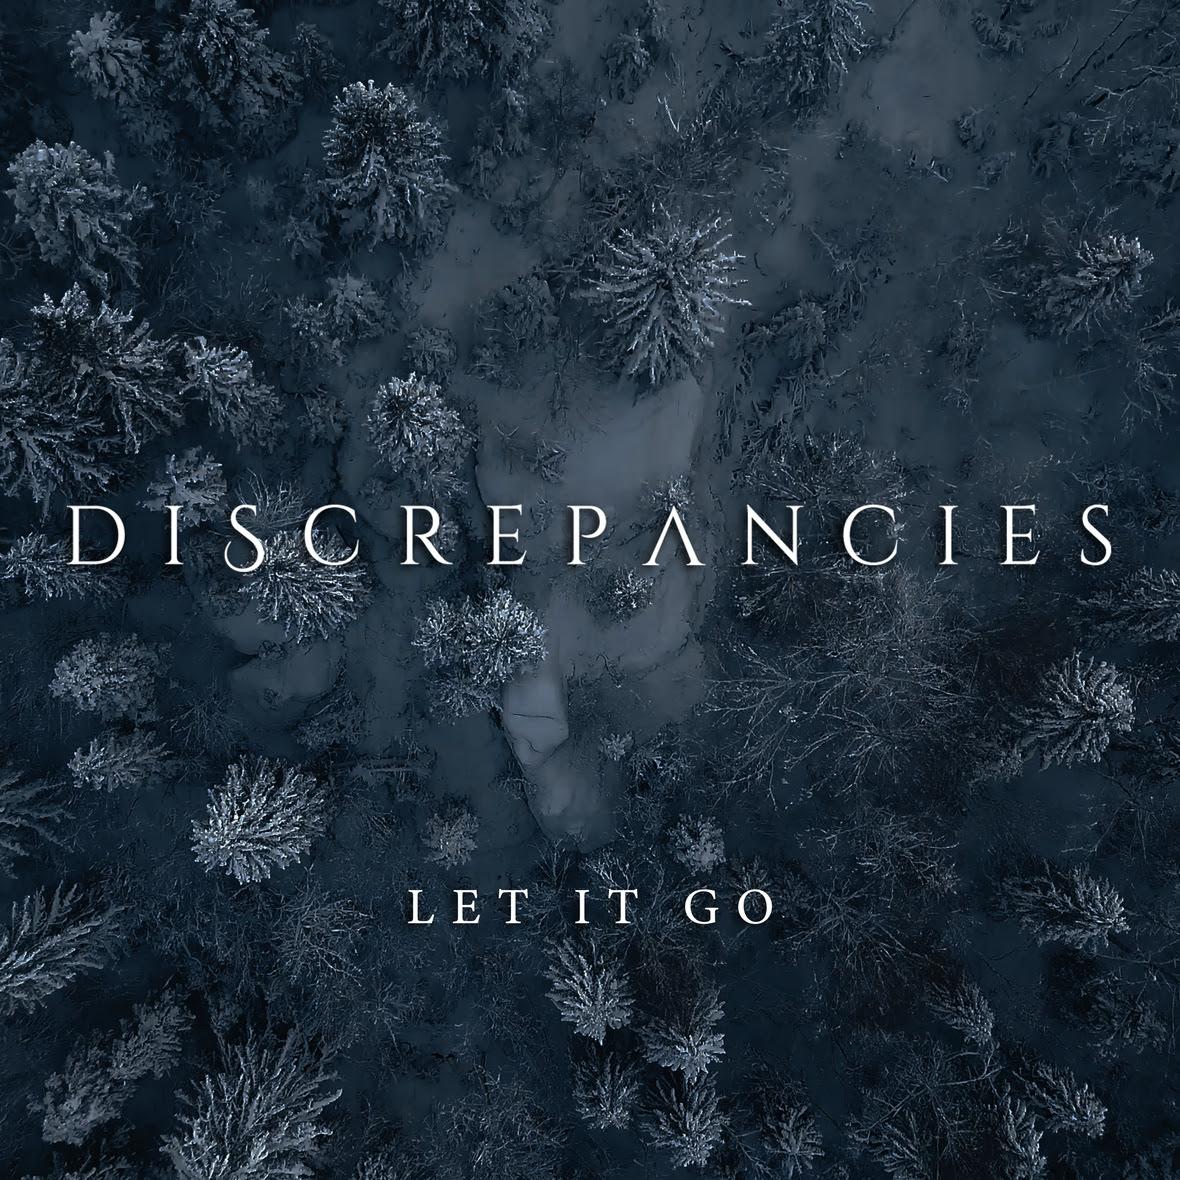 discrepancies let it go artwork